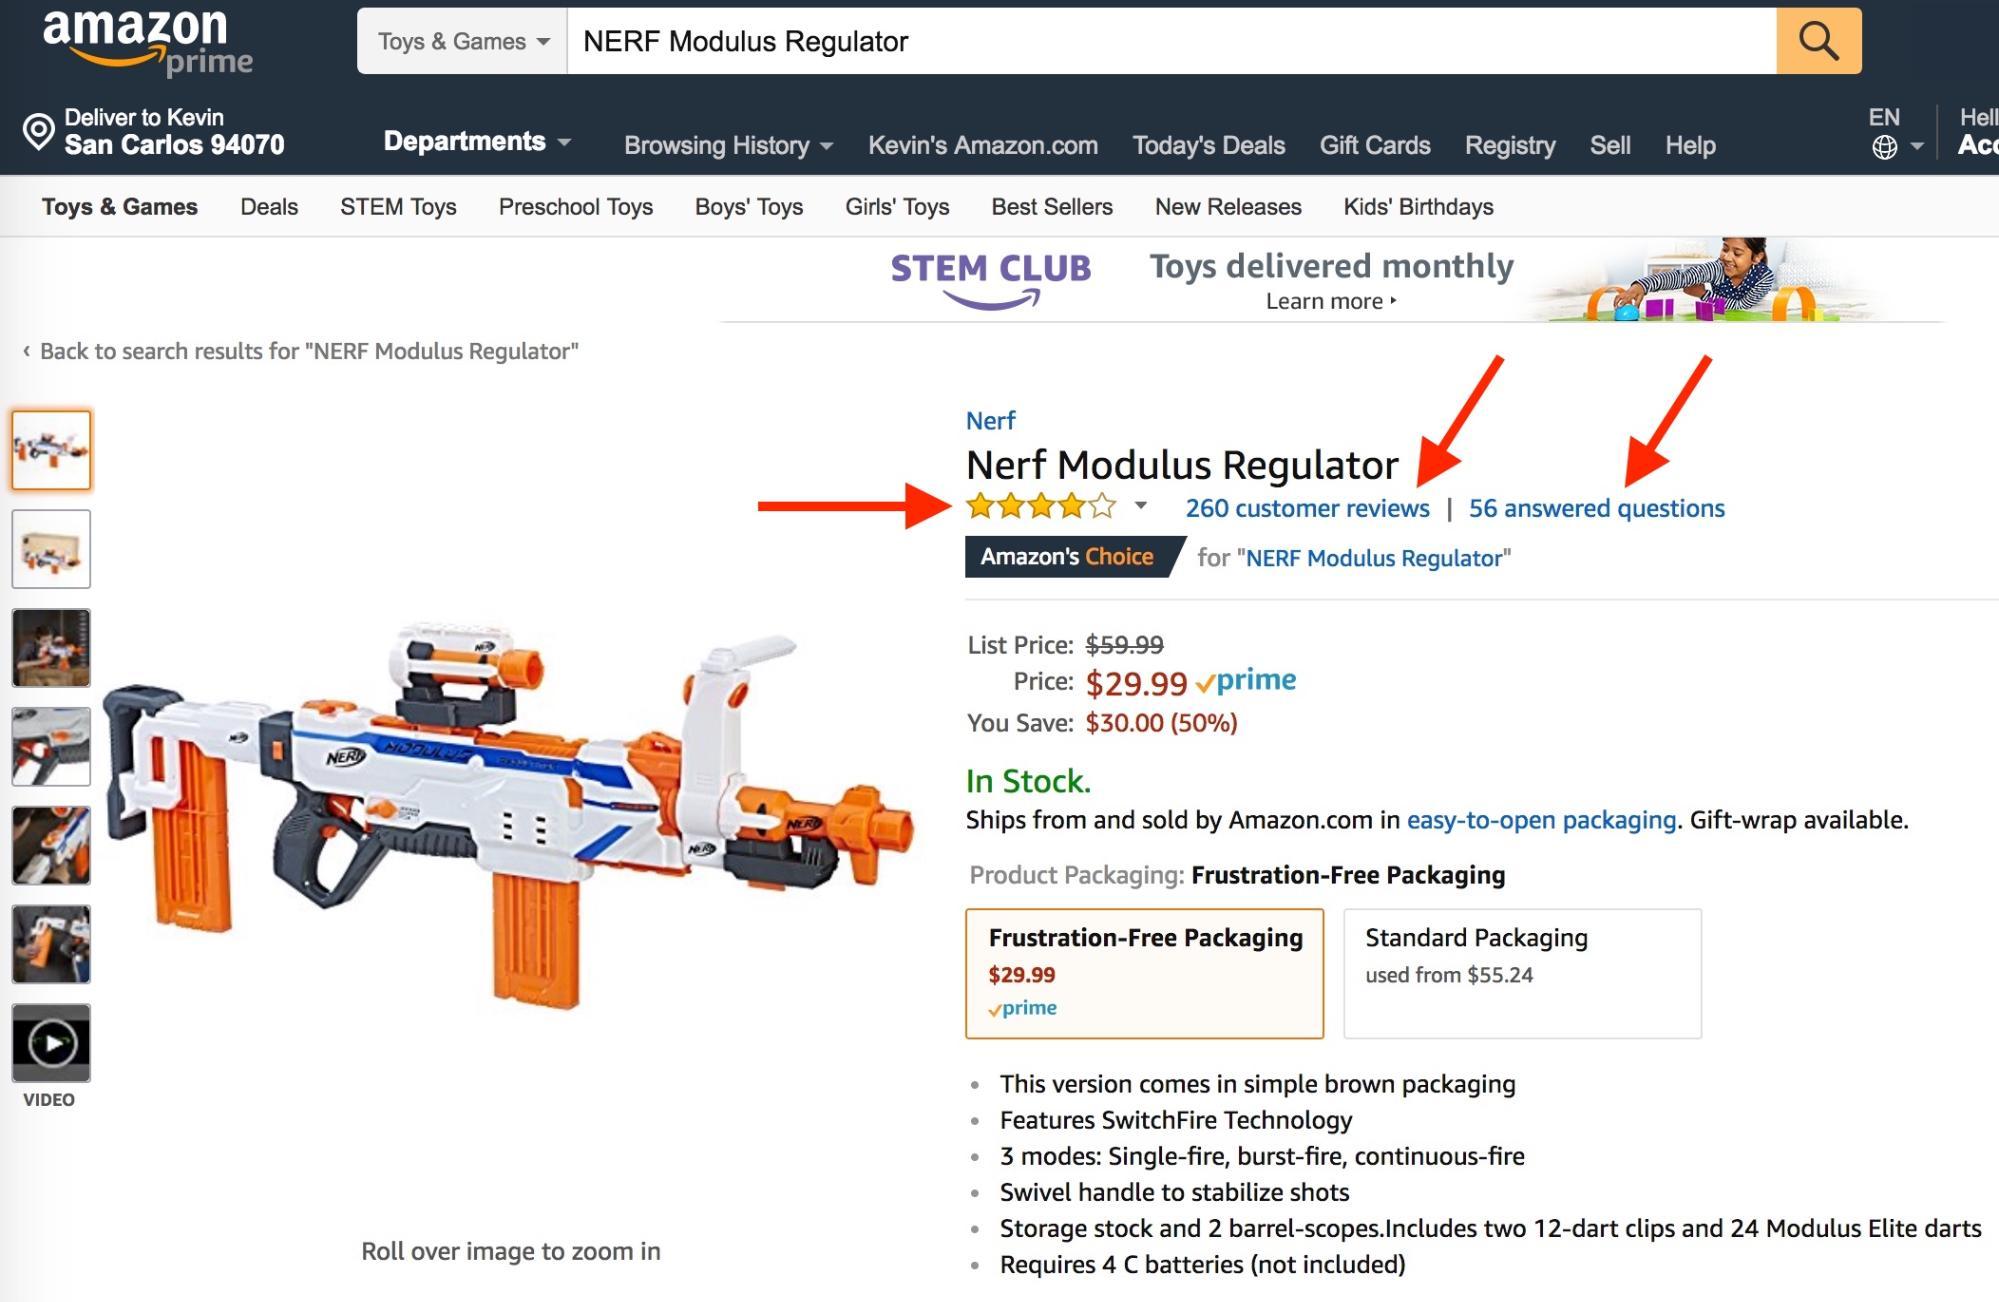 Screenshot showing an amazon product page